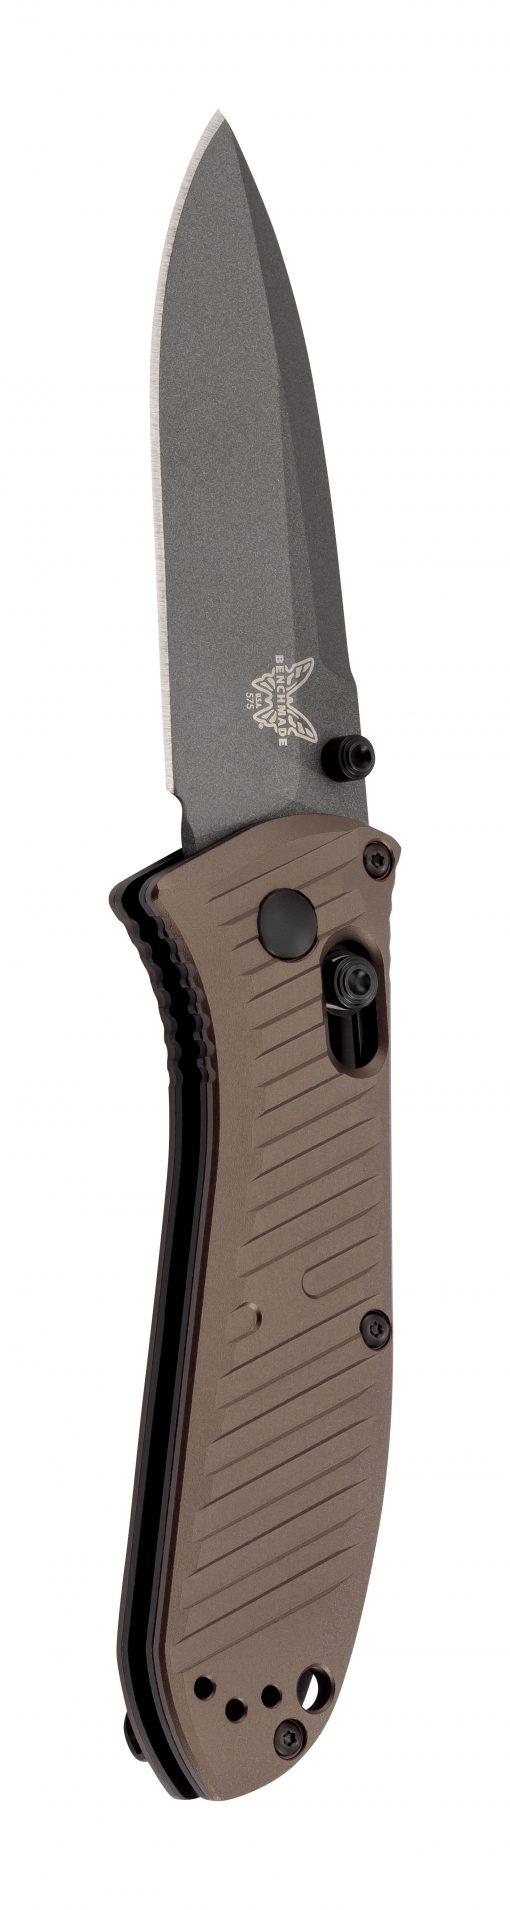 Benchmade Mini Presidio II Gray M4 Blade Burnt Bronze Aluminum Handle Front Side Open Up